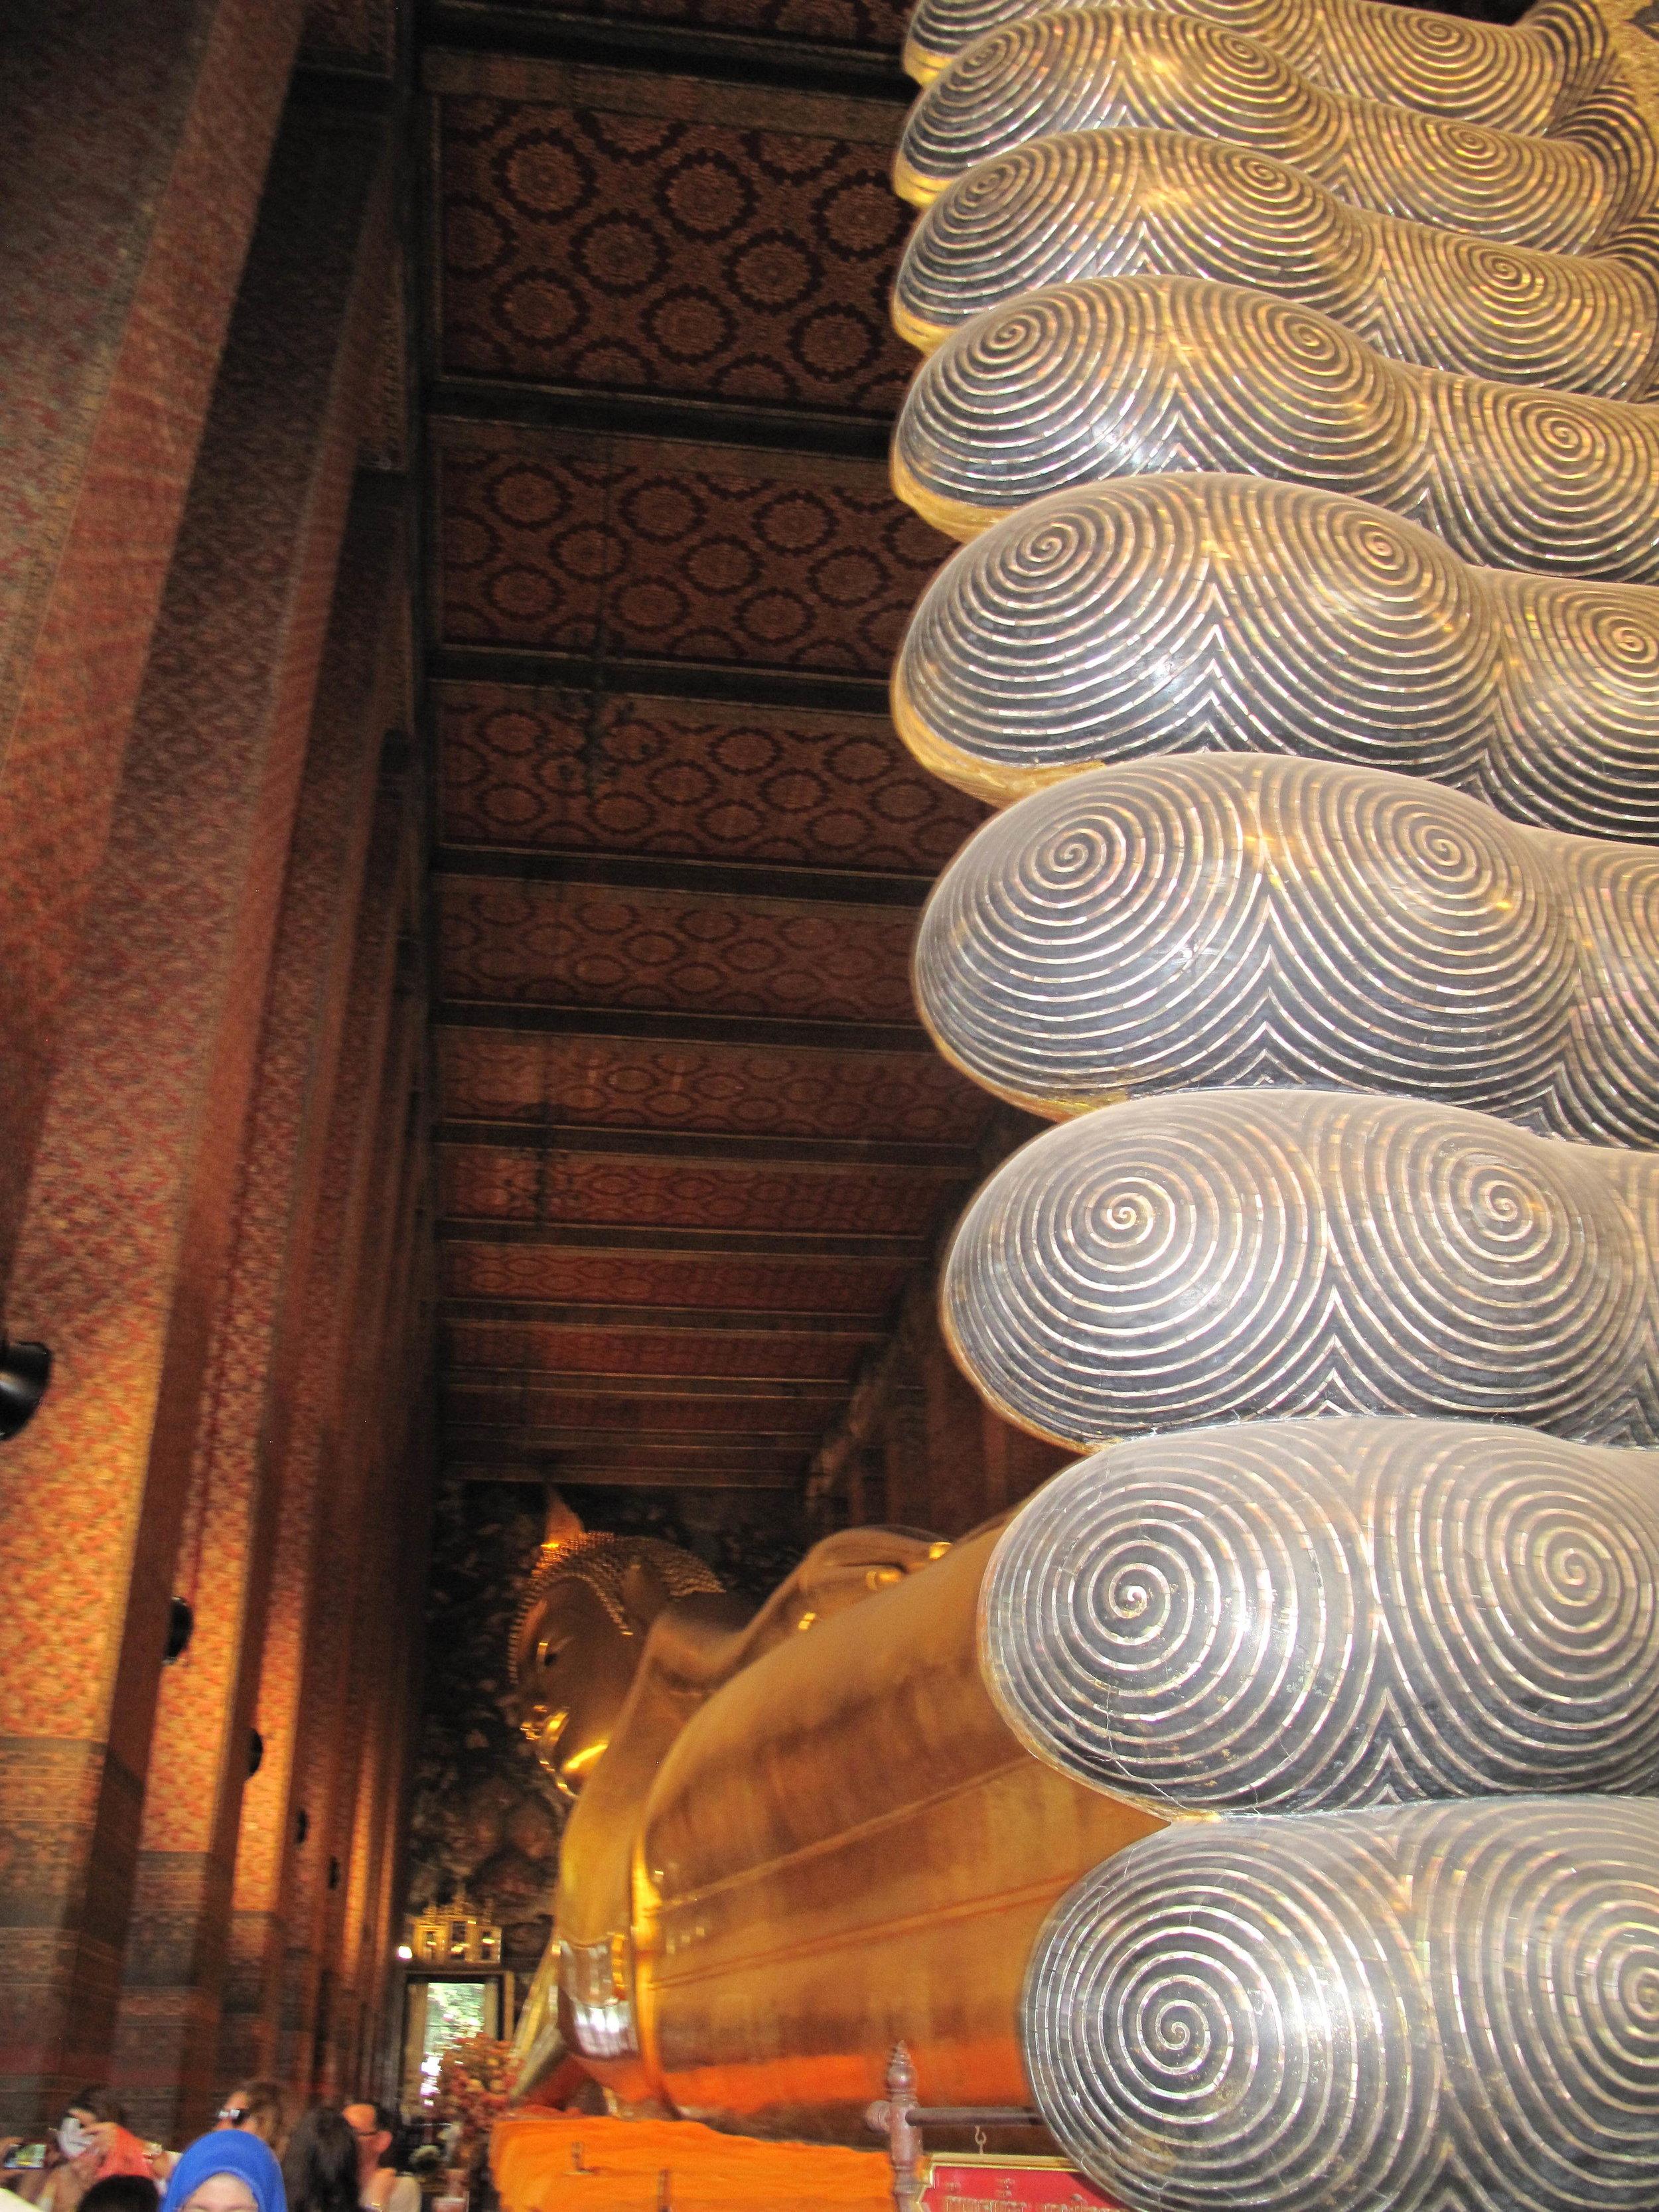 Reclining Buddha, Wat Pho, Bangkok